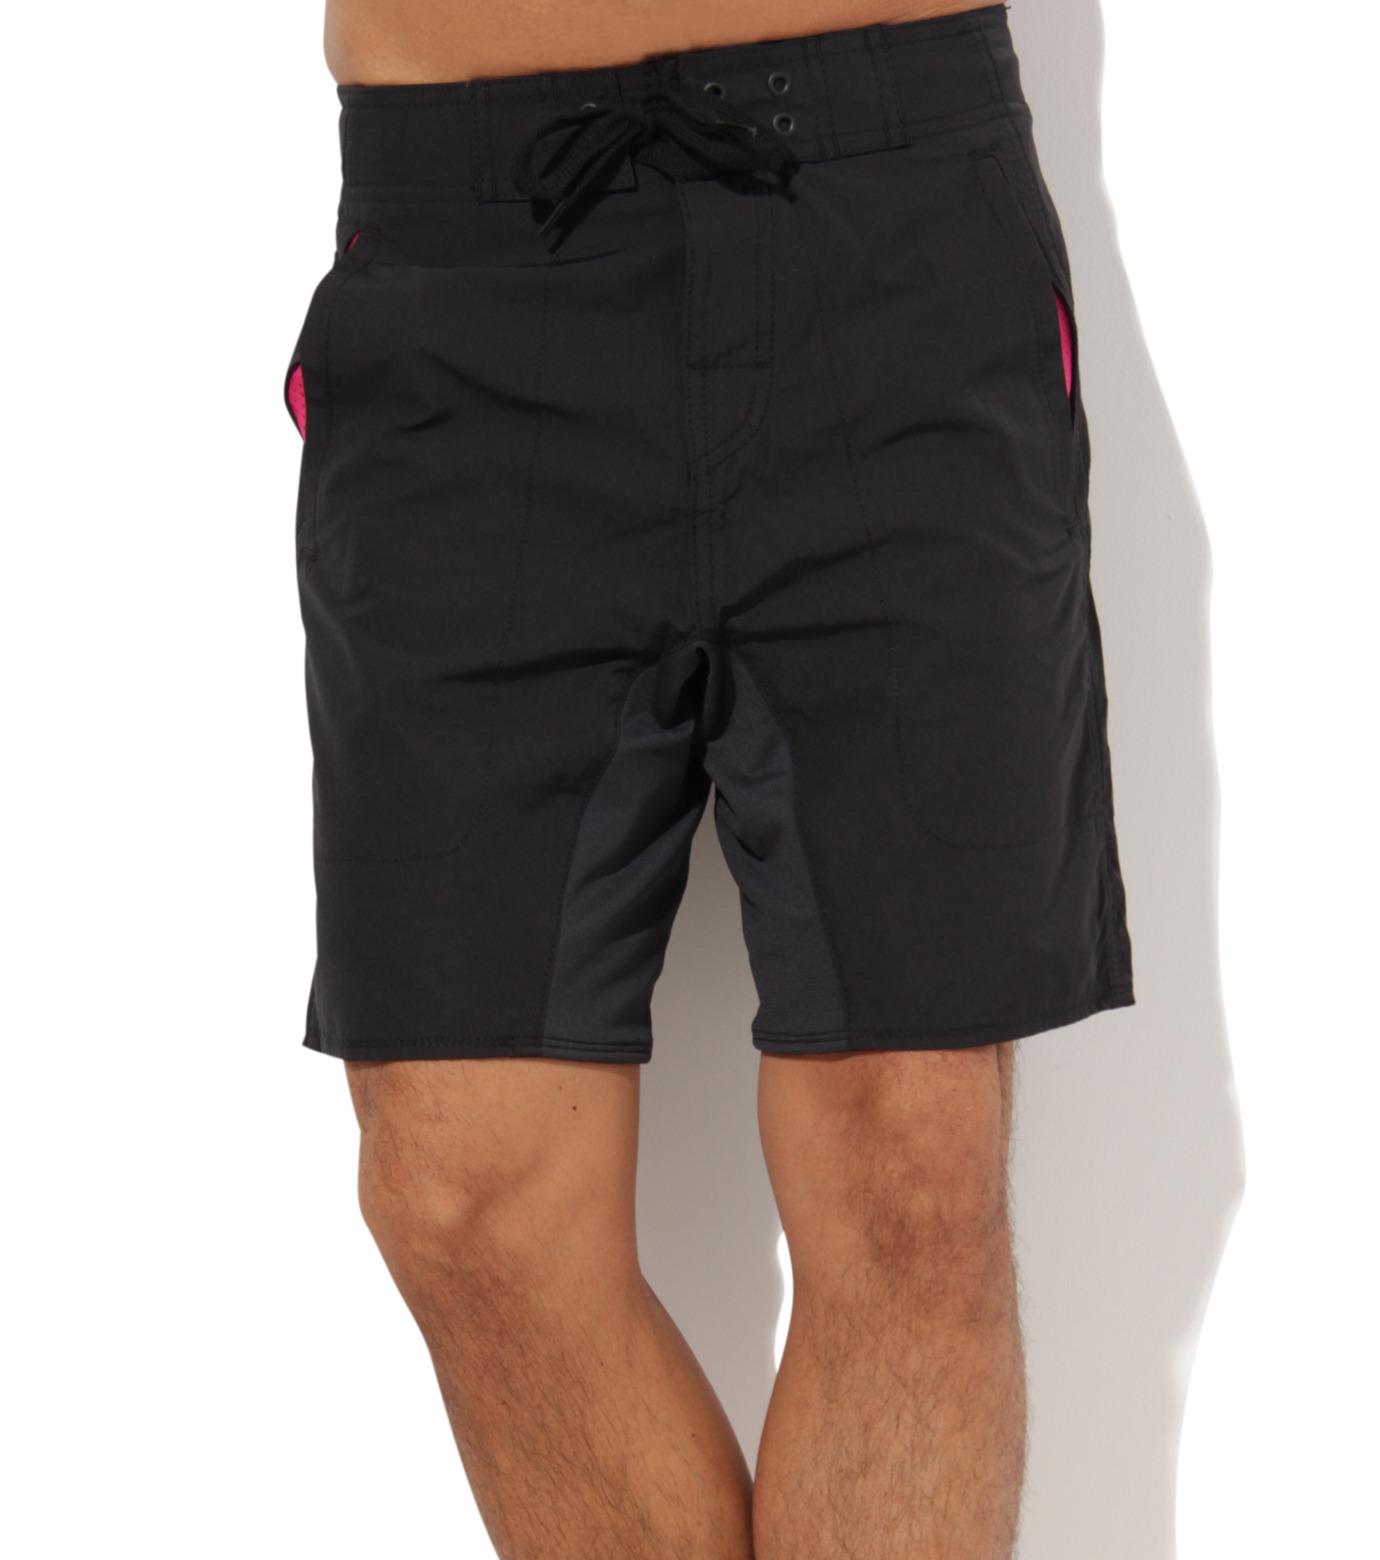 TWO TWO ONE(トゥートゥーワン)のSurf shorts short-BLACK(SWIMWEAR/SWIMWEAR)-15N948001-13 拡大詳細画像3